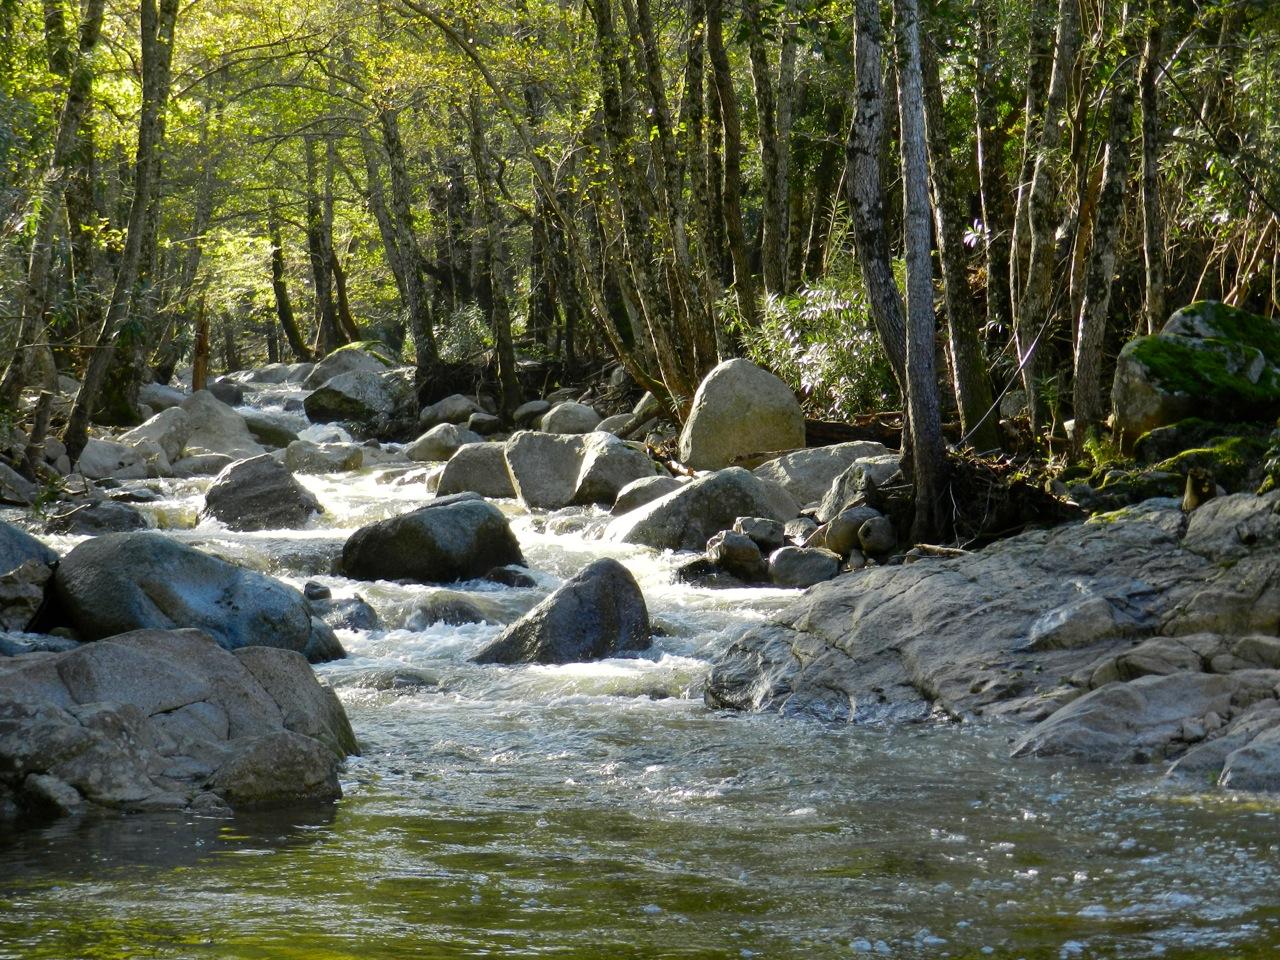 Fluss Riu Codule 'e Iluna